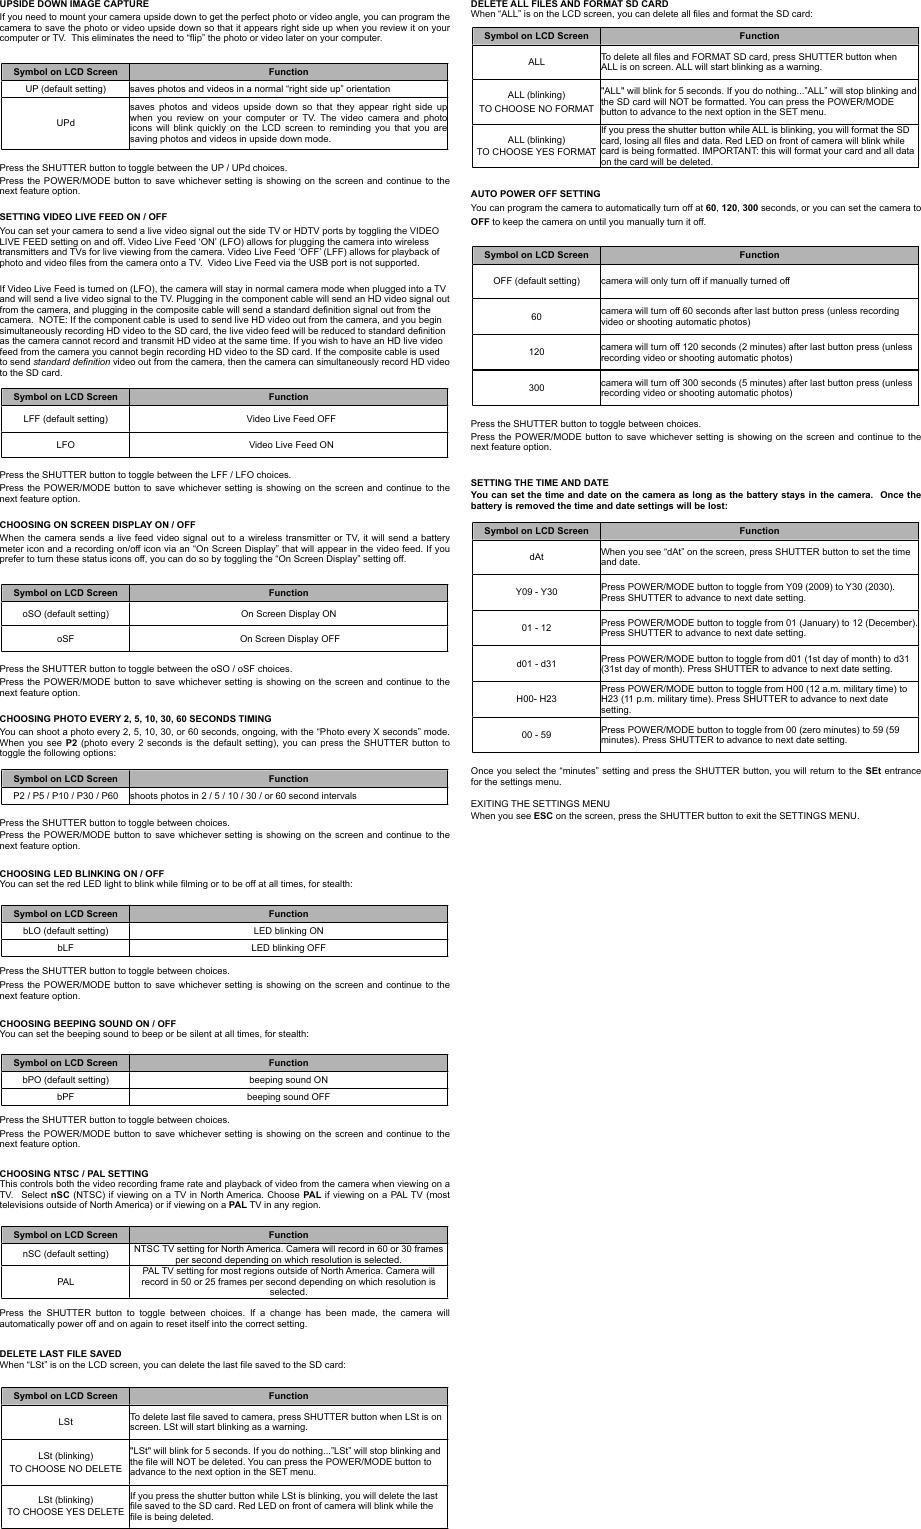 Gopro Hd Hero Naked Users Manual ManualsLib Makes It Easy